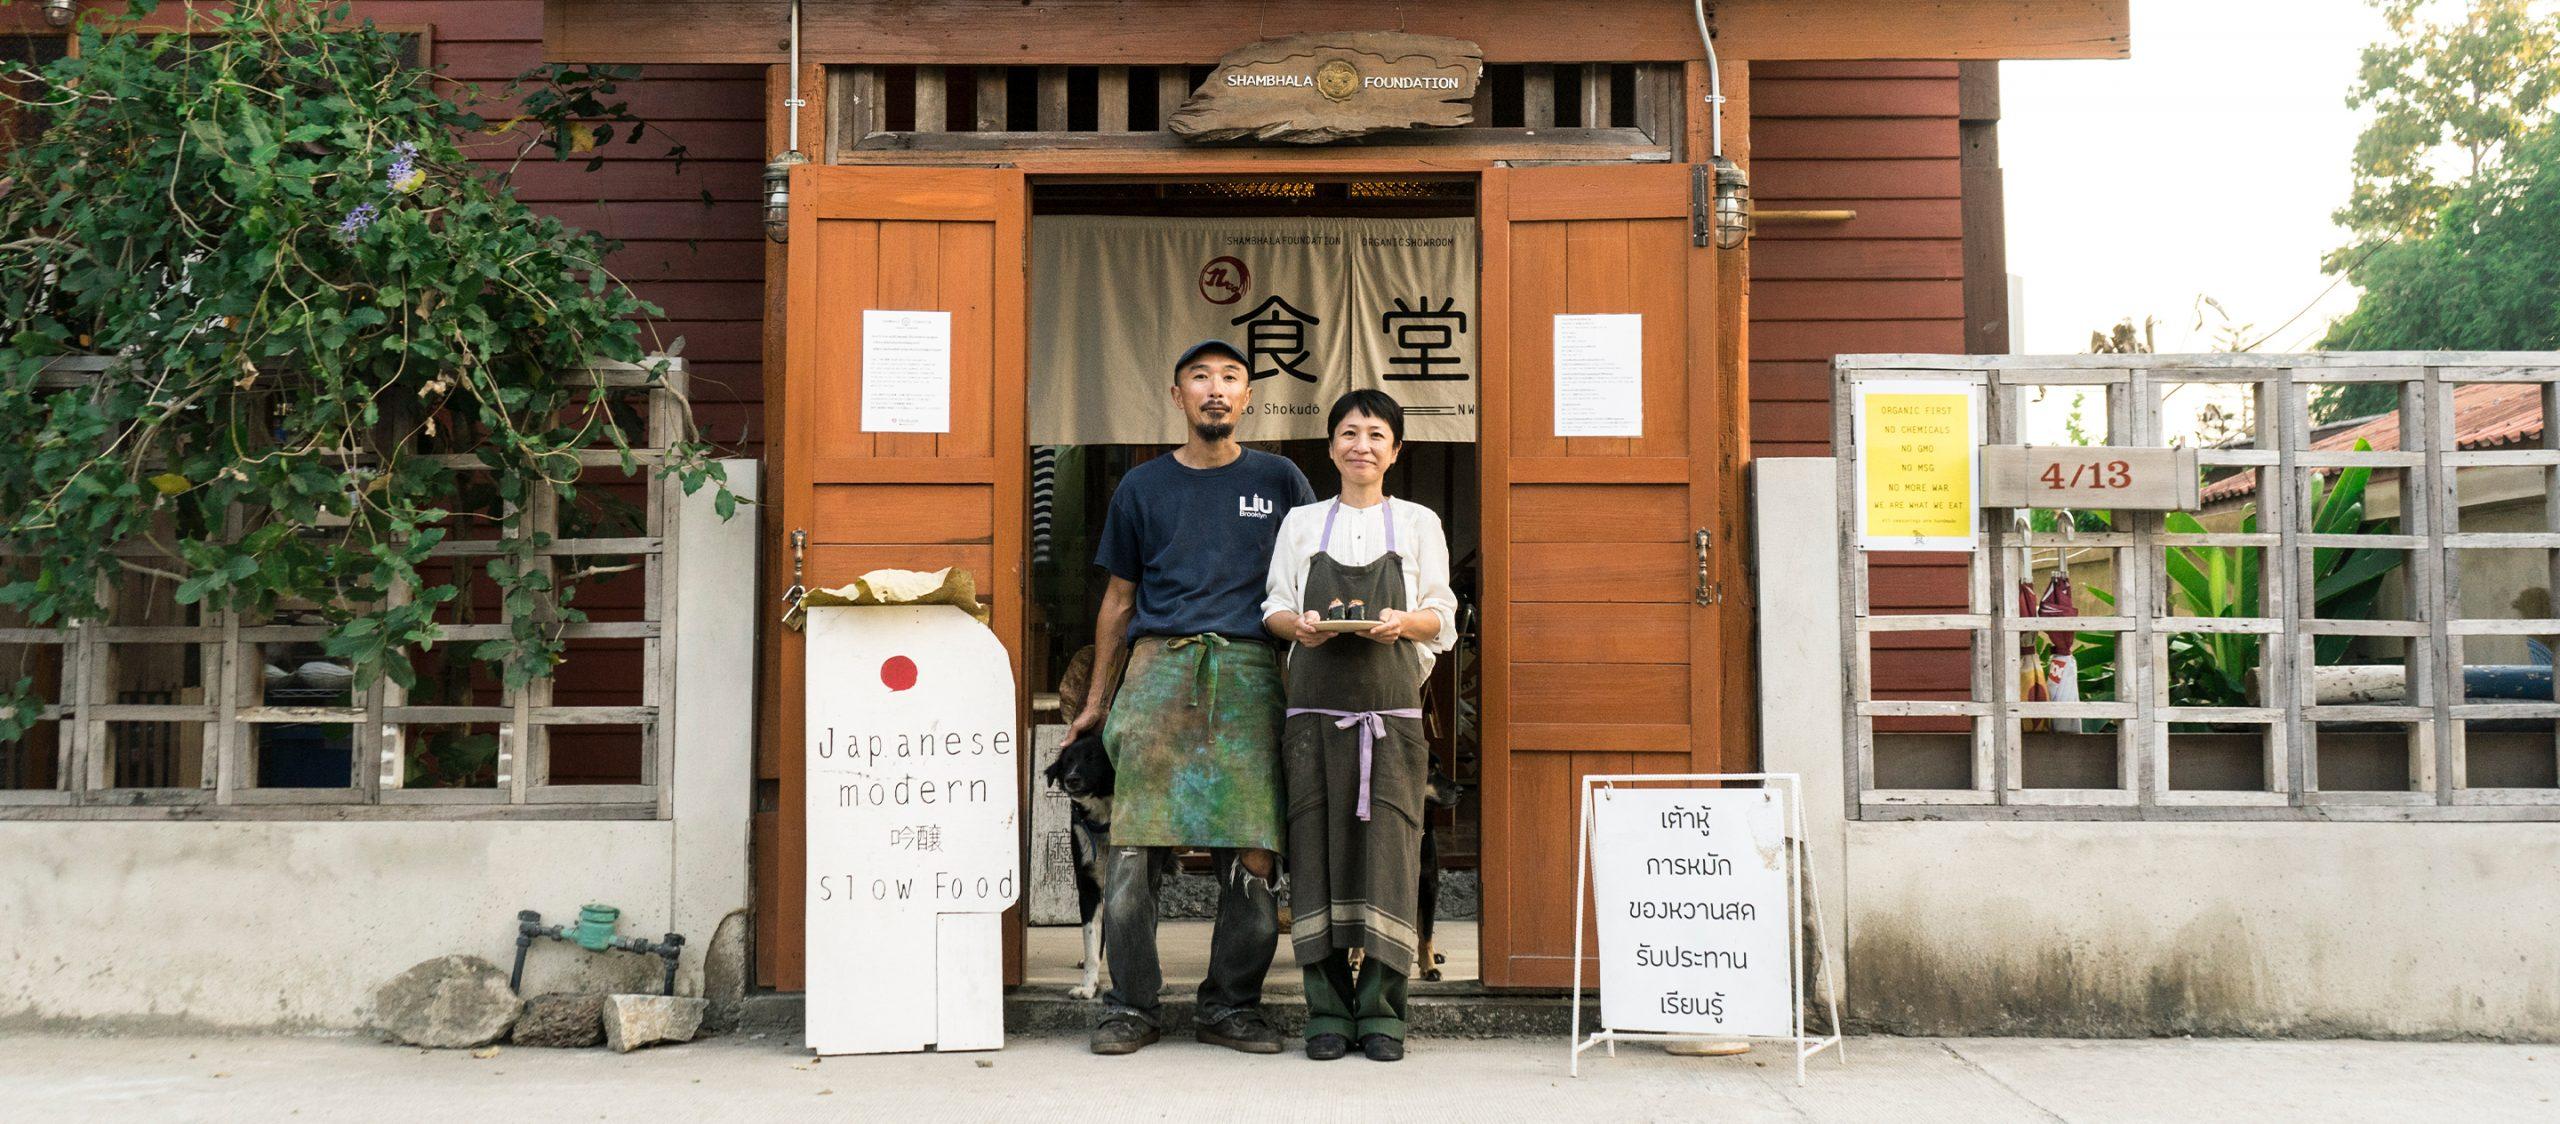 Aeeen : ร้านอาหารญี่ปุ่นในเชียงใหม่ที่เสิร์ฟเมนูดัดแปลงจากมื้ออาหารของพระเซน